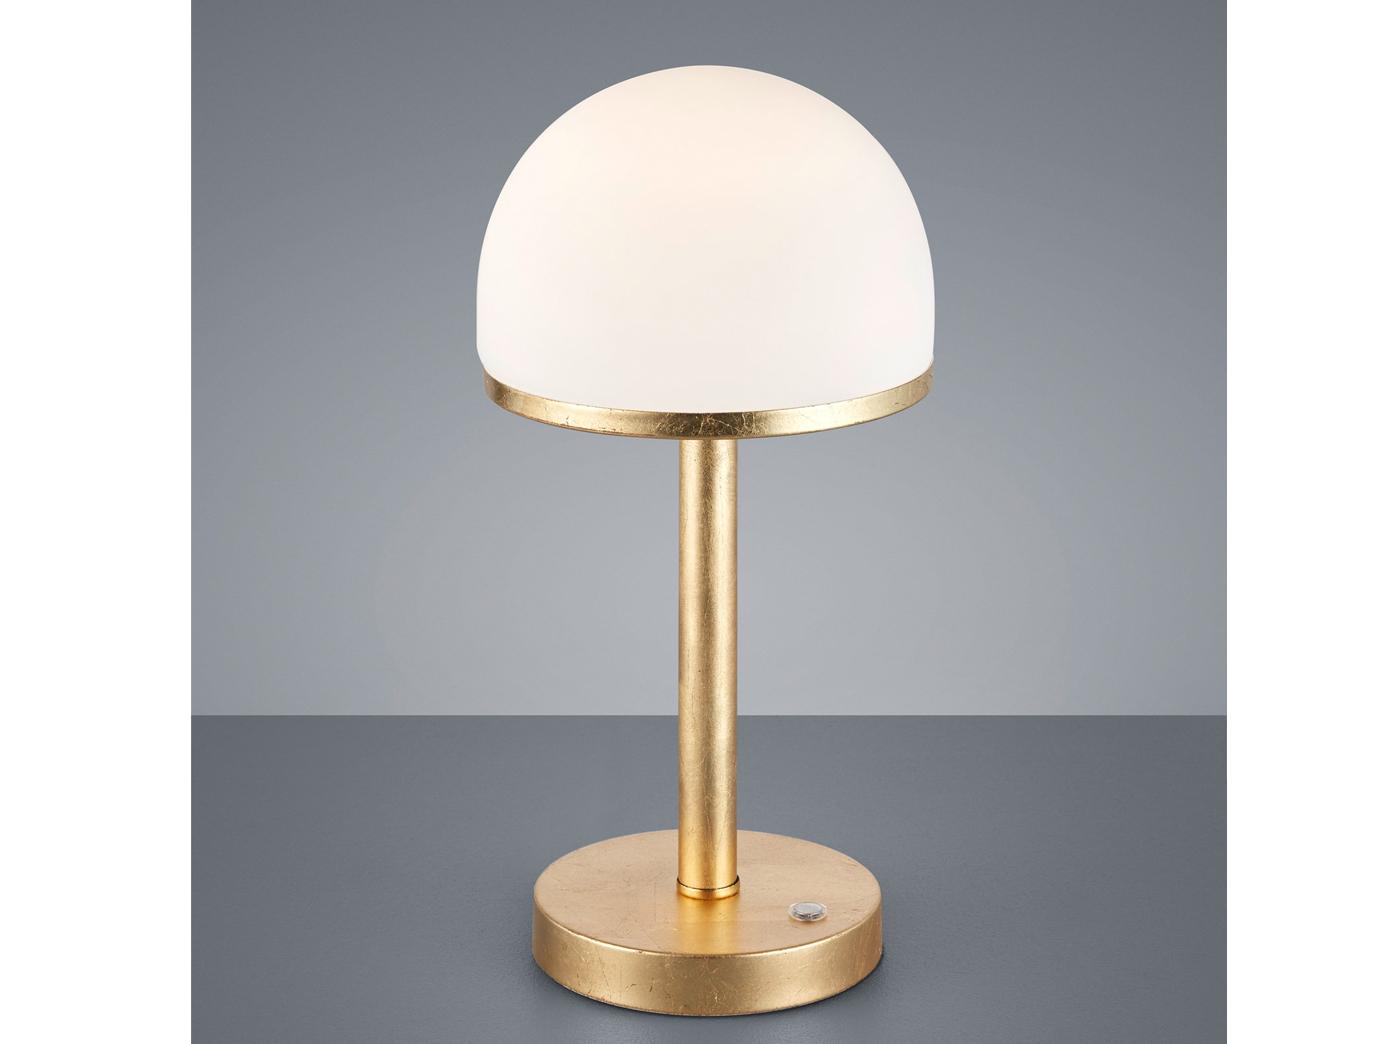 TOUCH Design LED Nachttischlampe dimmbare Wohnzimmerleuchte Gold foliert   weiss